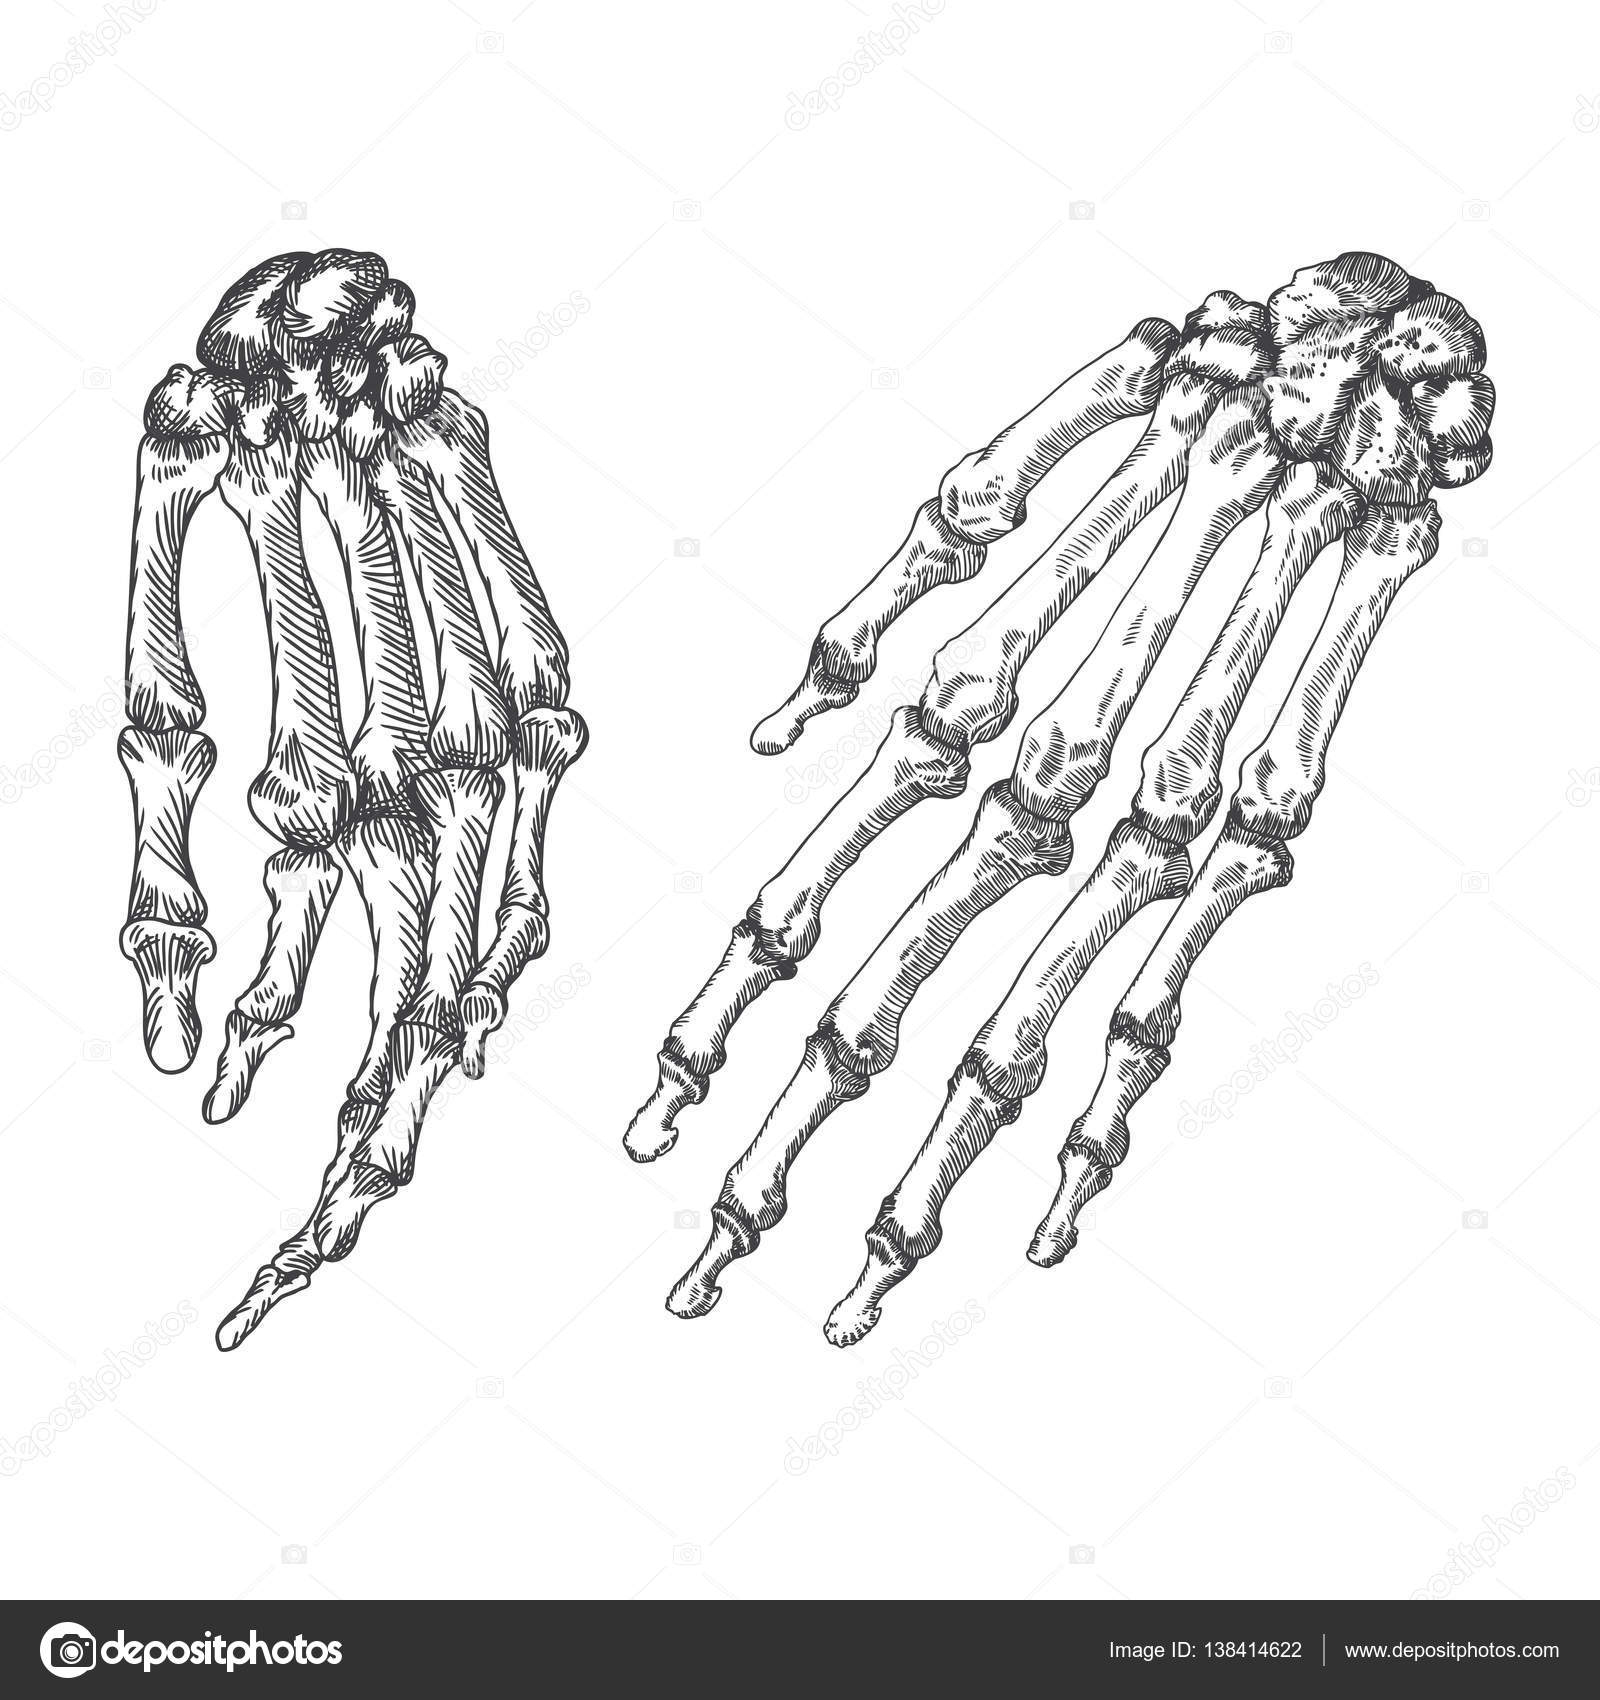 Muñecas esqueleto humano huesos dibujo — Archivo Imágenes ...